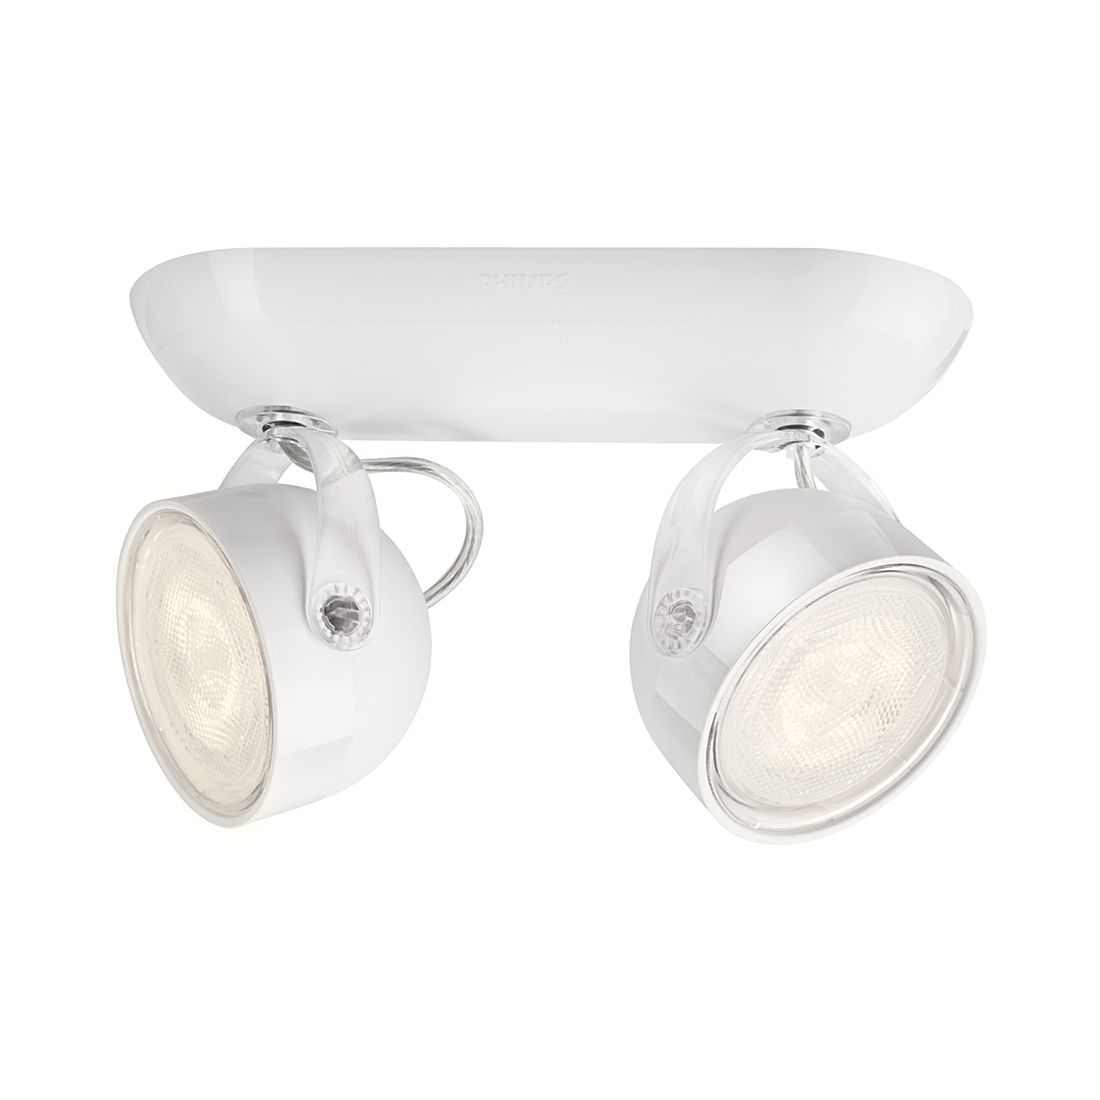 EEK A+, LED-Spotbalken myLiving Dyna II – Weiß – 2-flammig, Philips jetzt kaufen